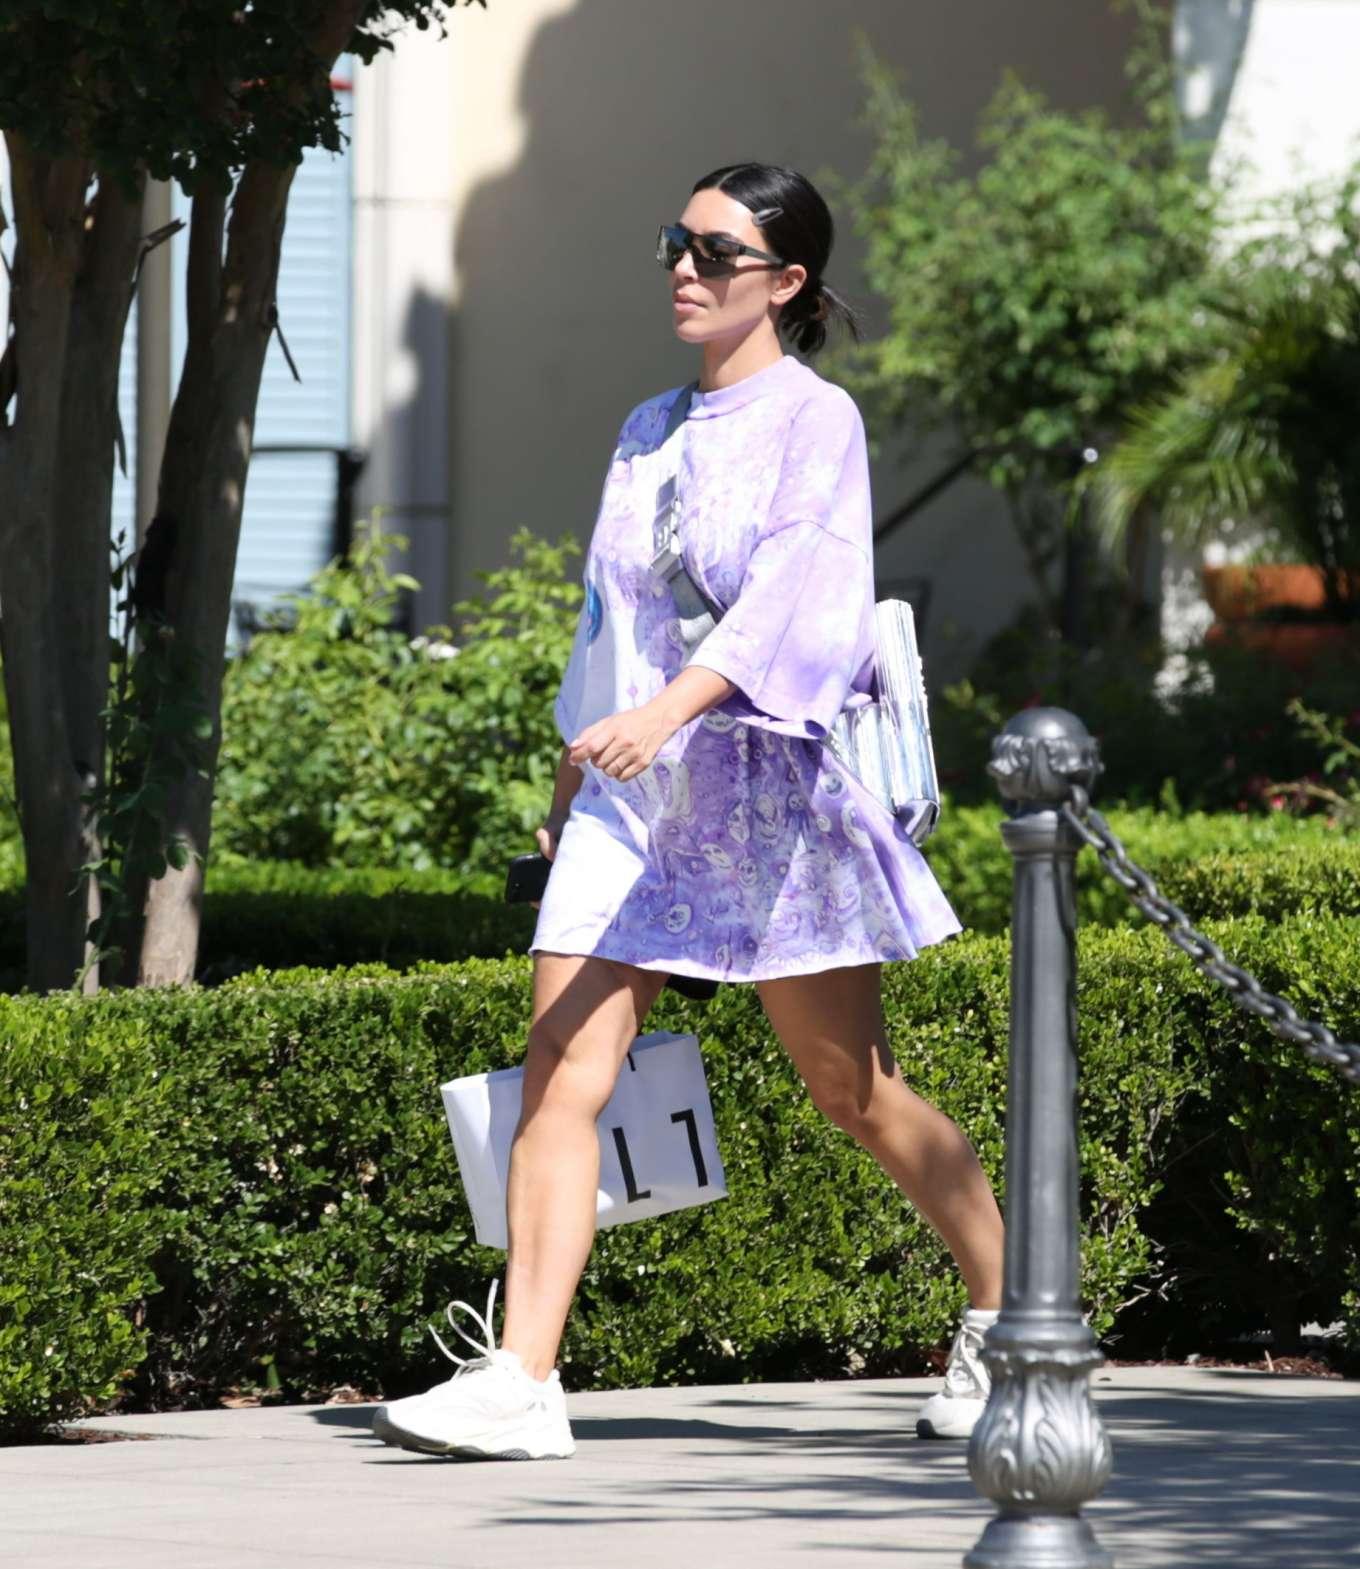 Kim Kardashian 2019 : Kim Kardashian – Out and about in Malibu-25